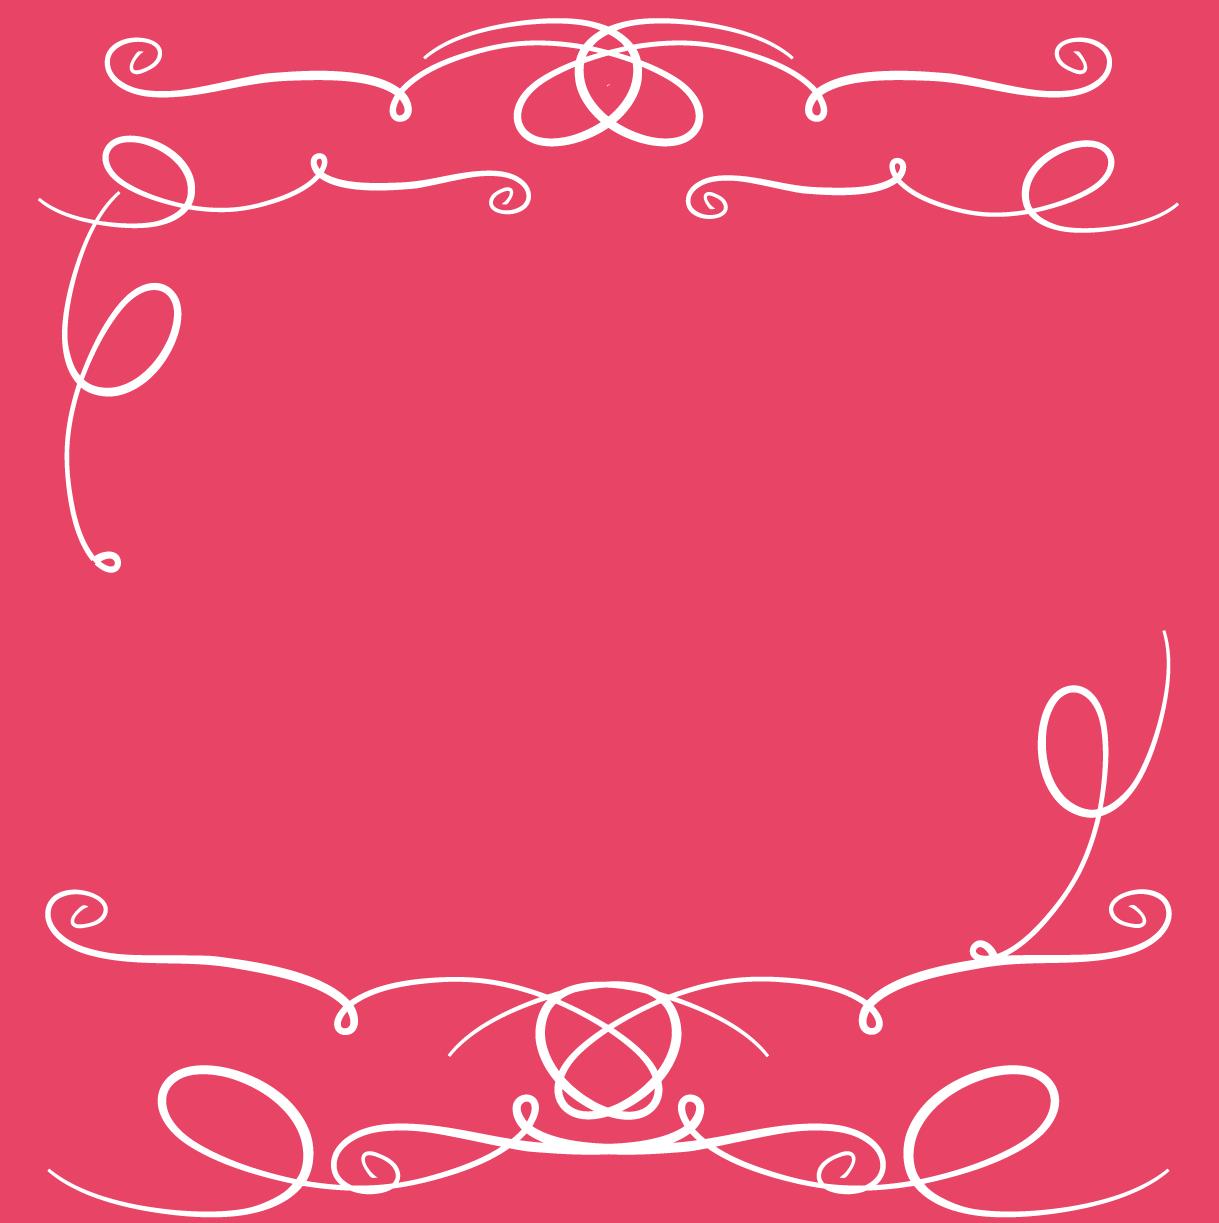 Sample 7Th Birthday Invitation as Perfect Design To Make Perfect Invitation Layout